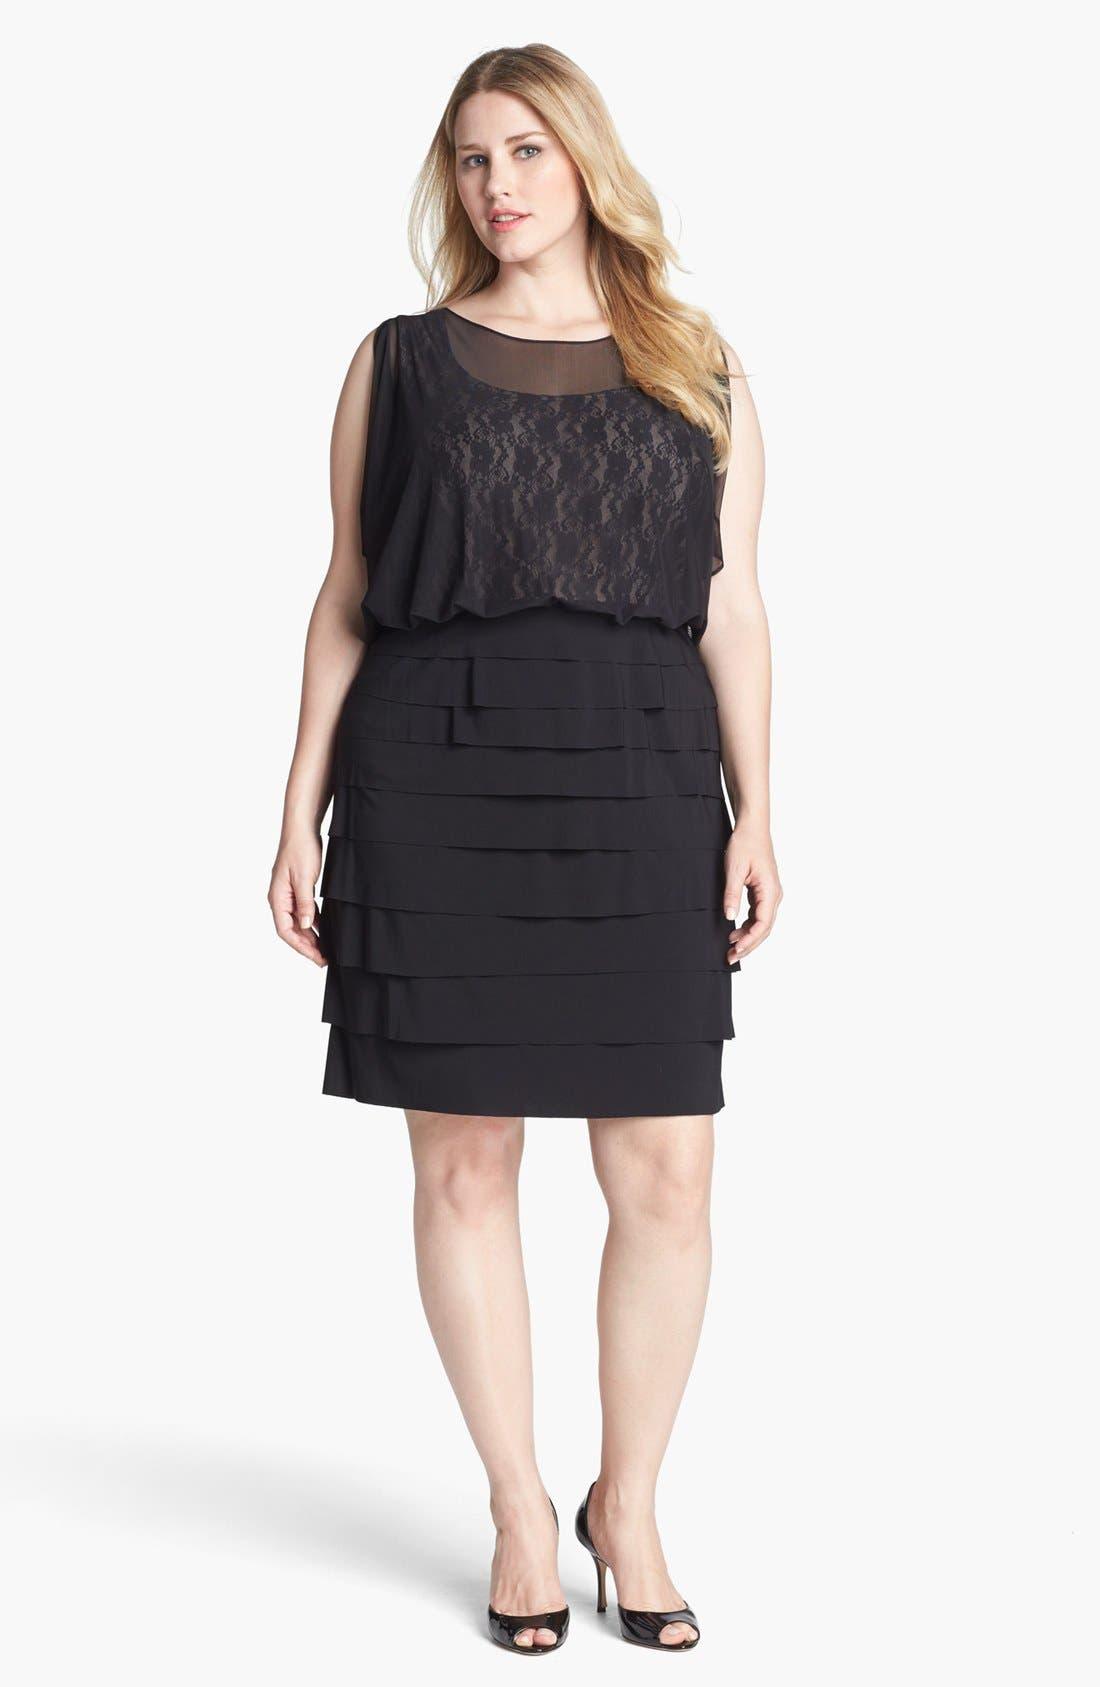 Alternate Image 1 Selected - London Times Lace & Mesh Tiered Blouson Dress (Plus Size)